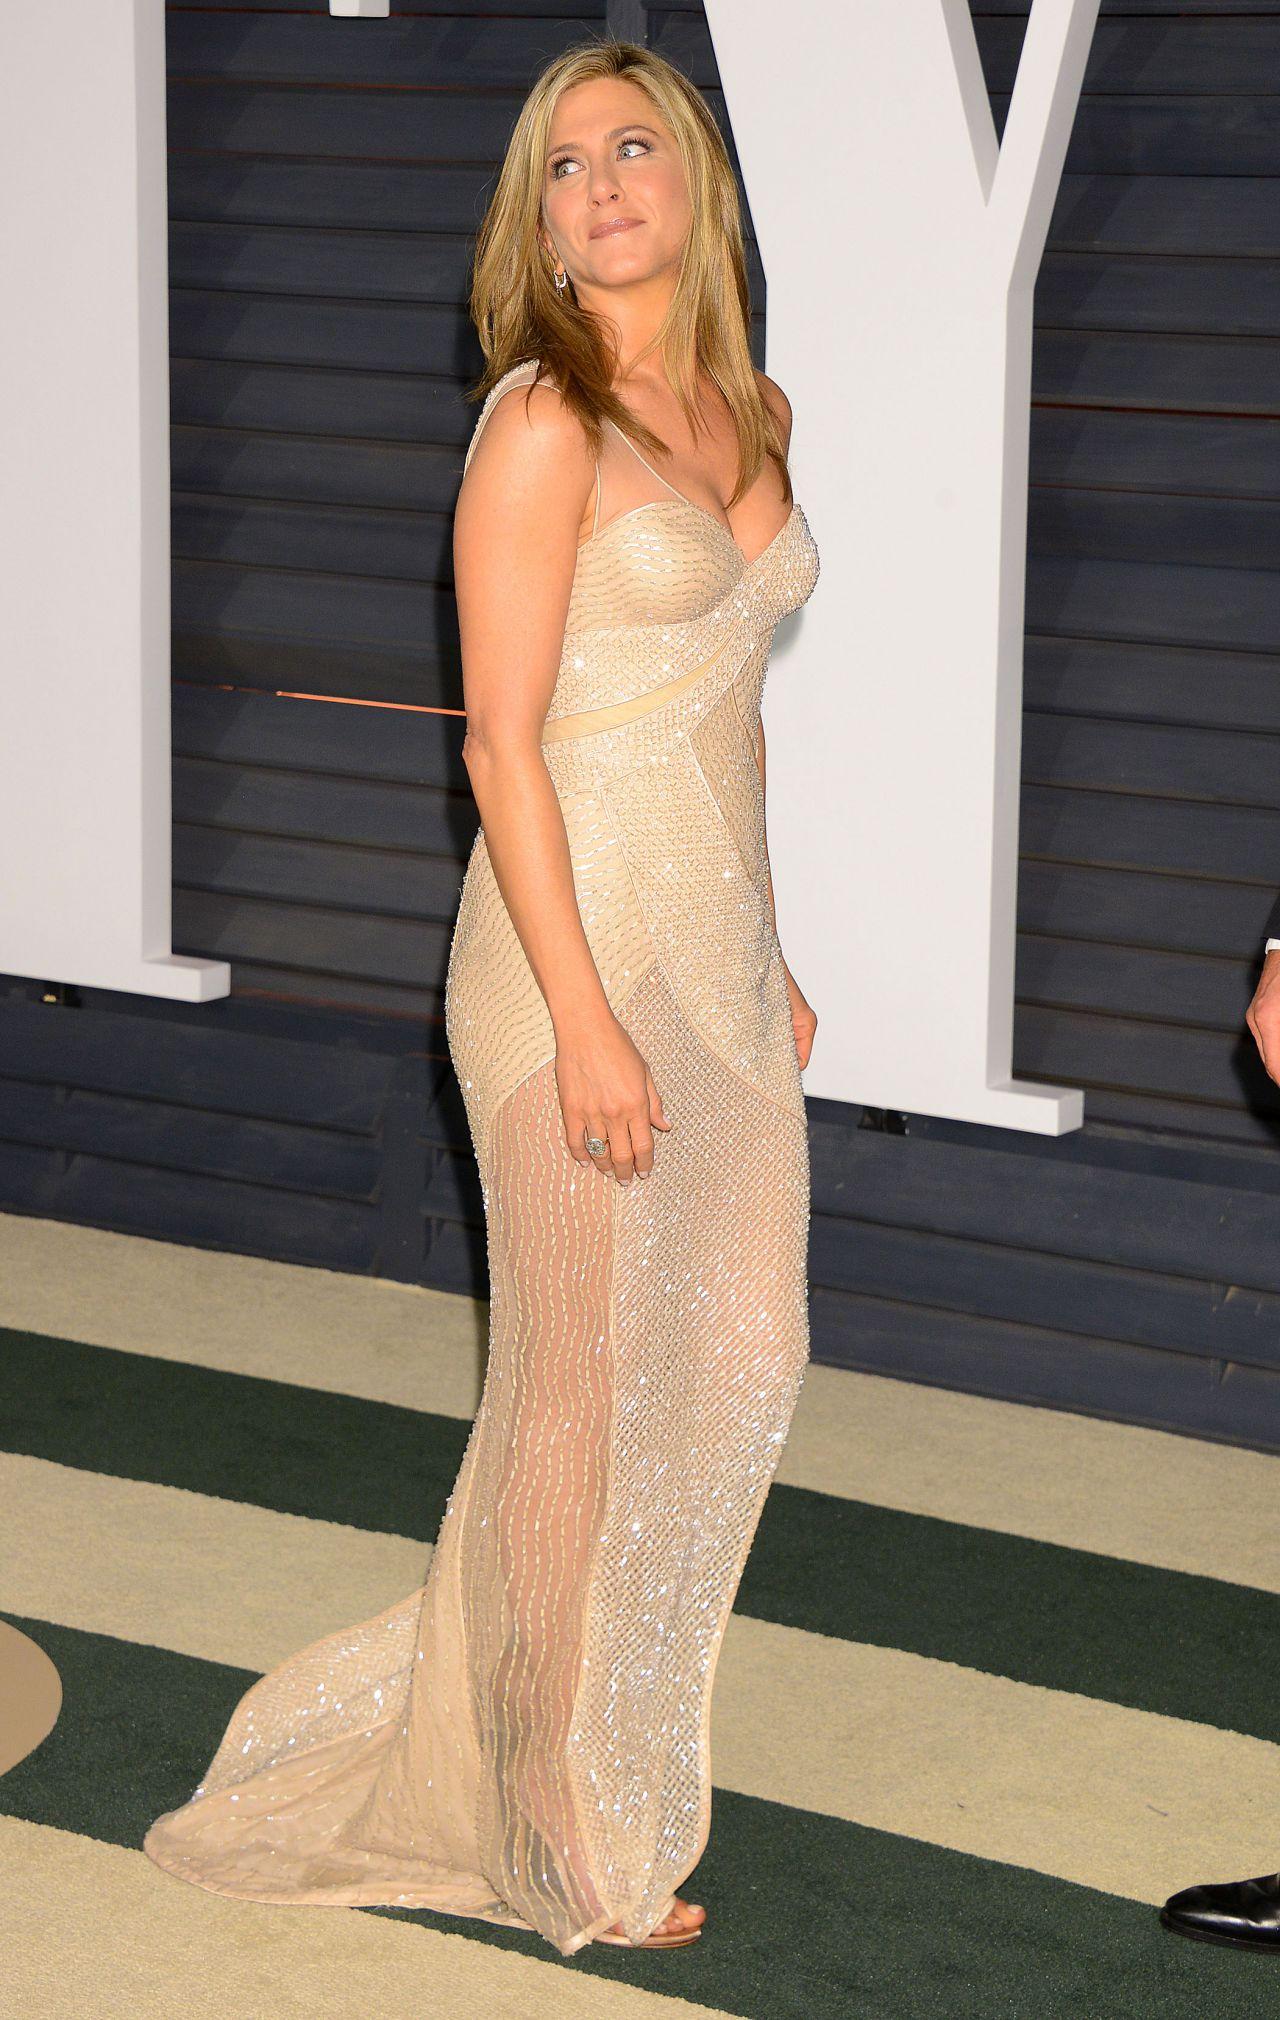 Actriz Porno Aniston jenifer aniston vanity fair